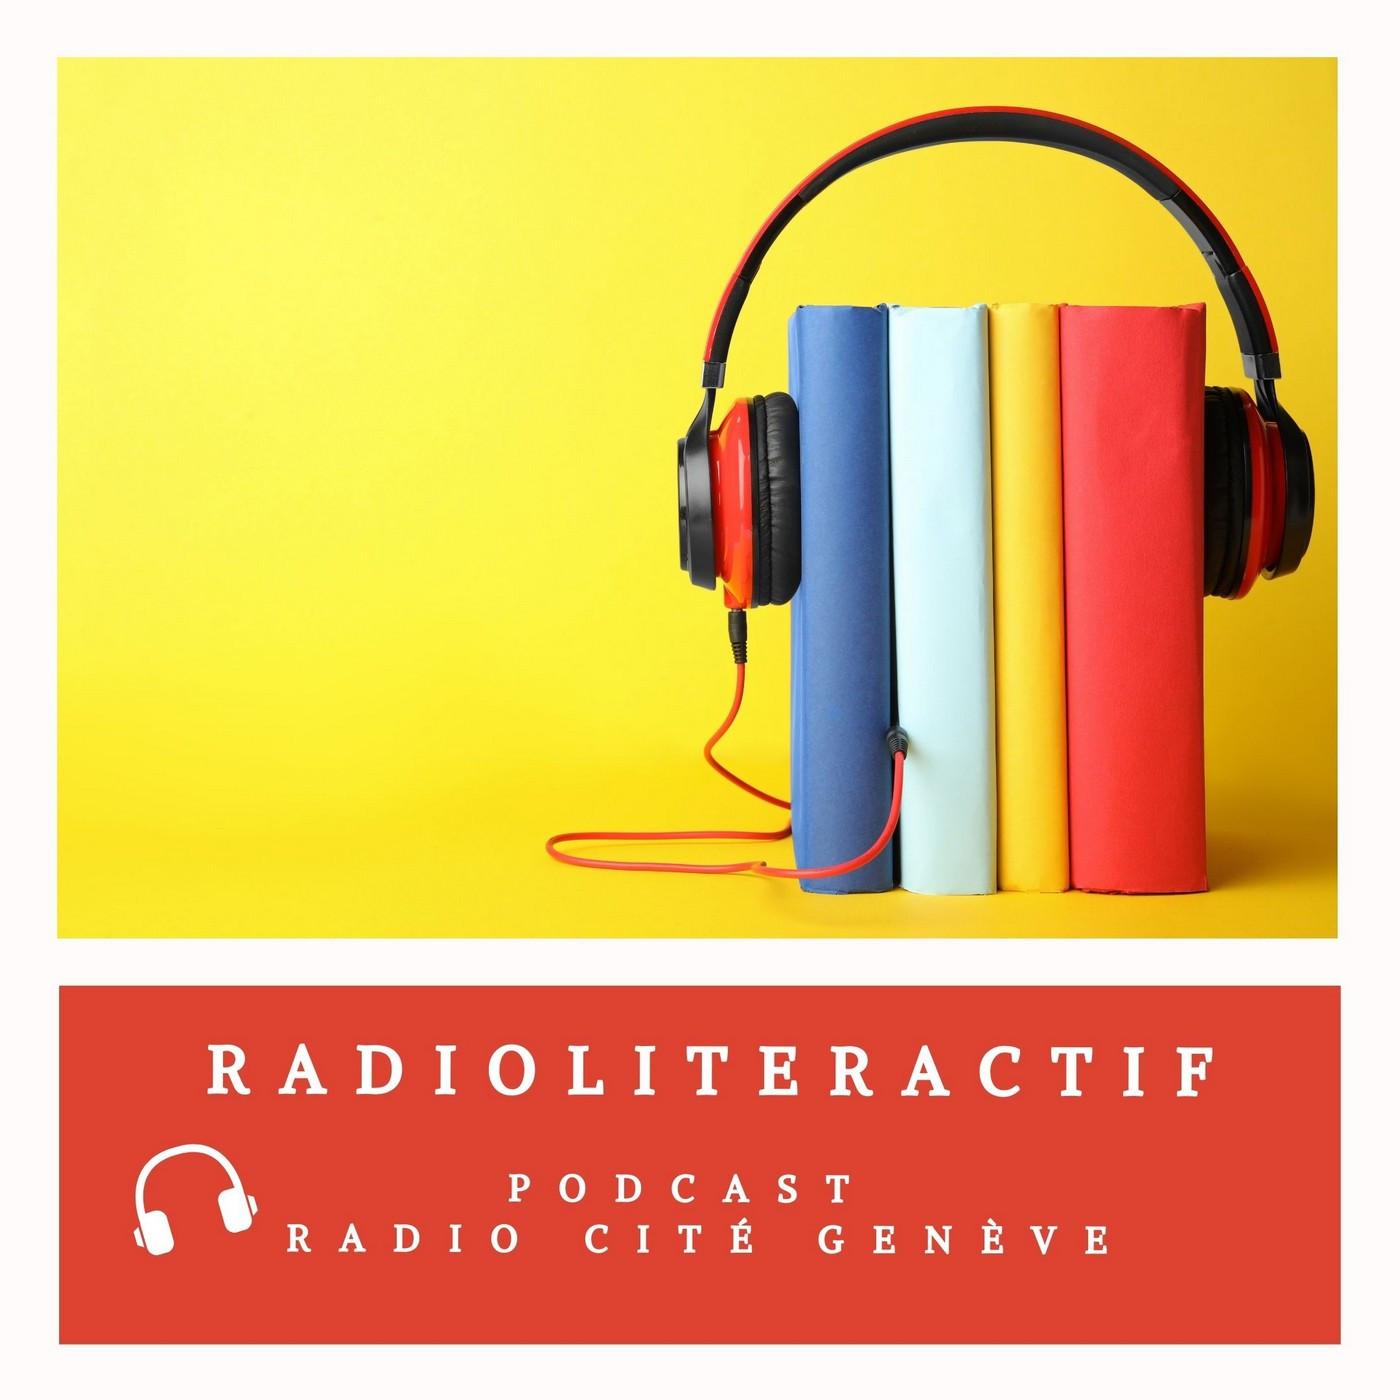 Radioliteractif du 19/10/20 - Anouk Gonzenbach-Dunant